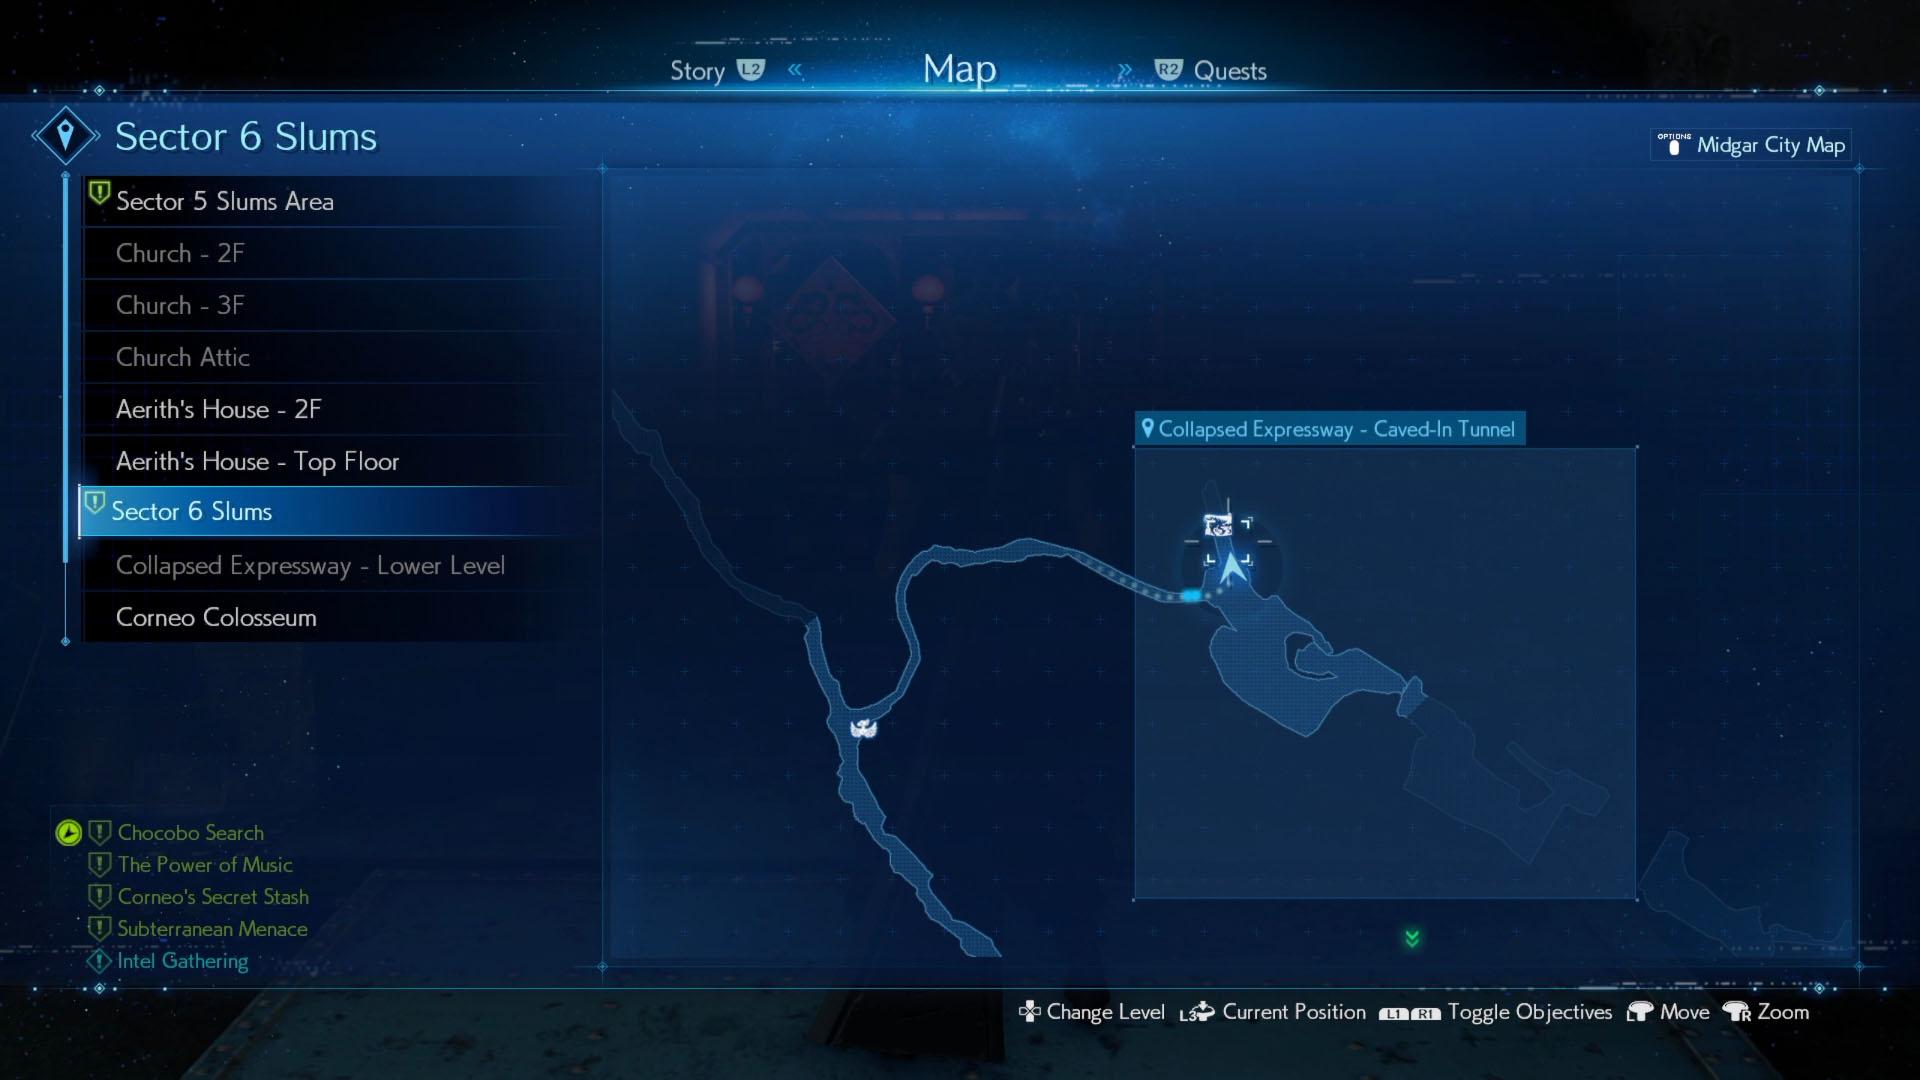 Corneo Secret Stash locations - Collapsed Expressway - Final Fantasy 7 Remake